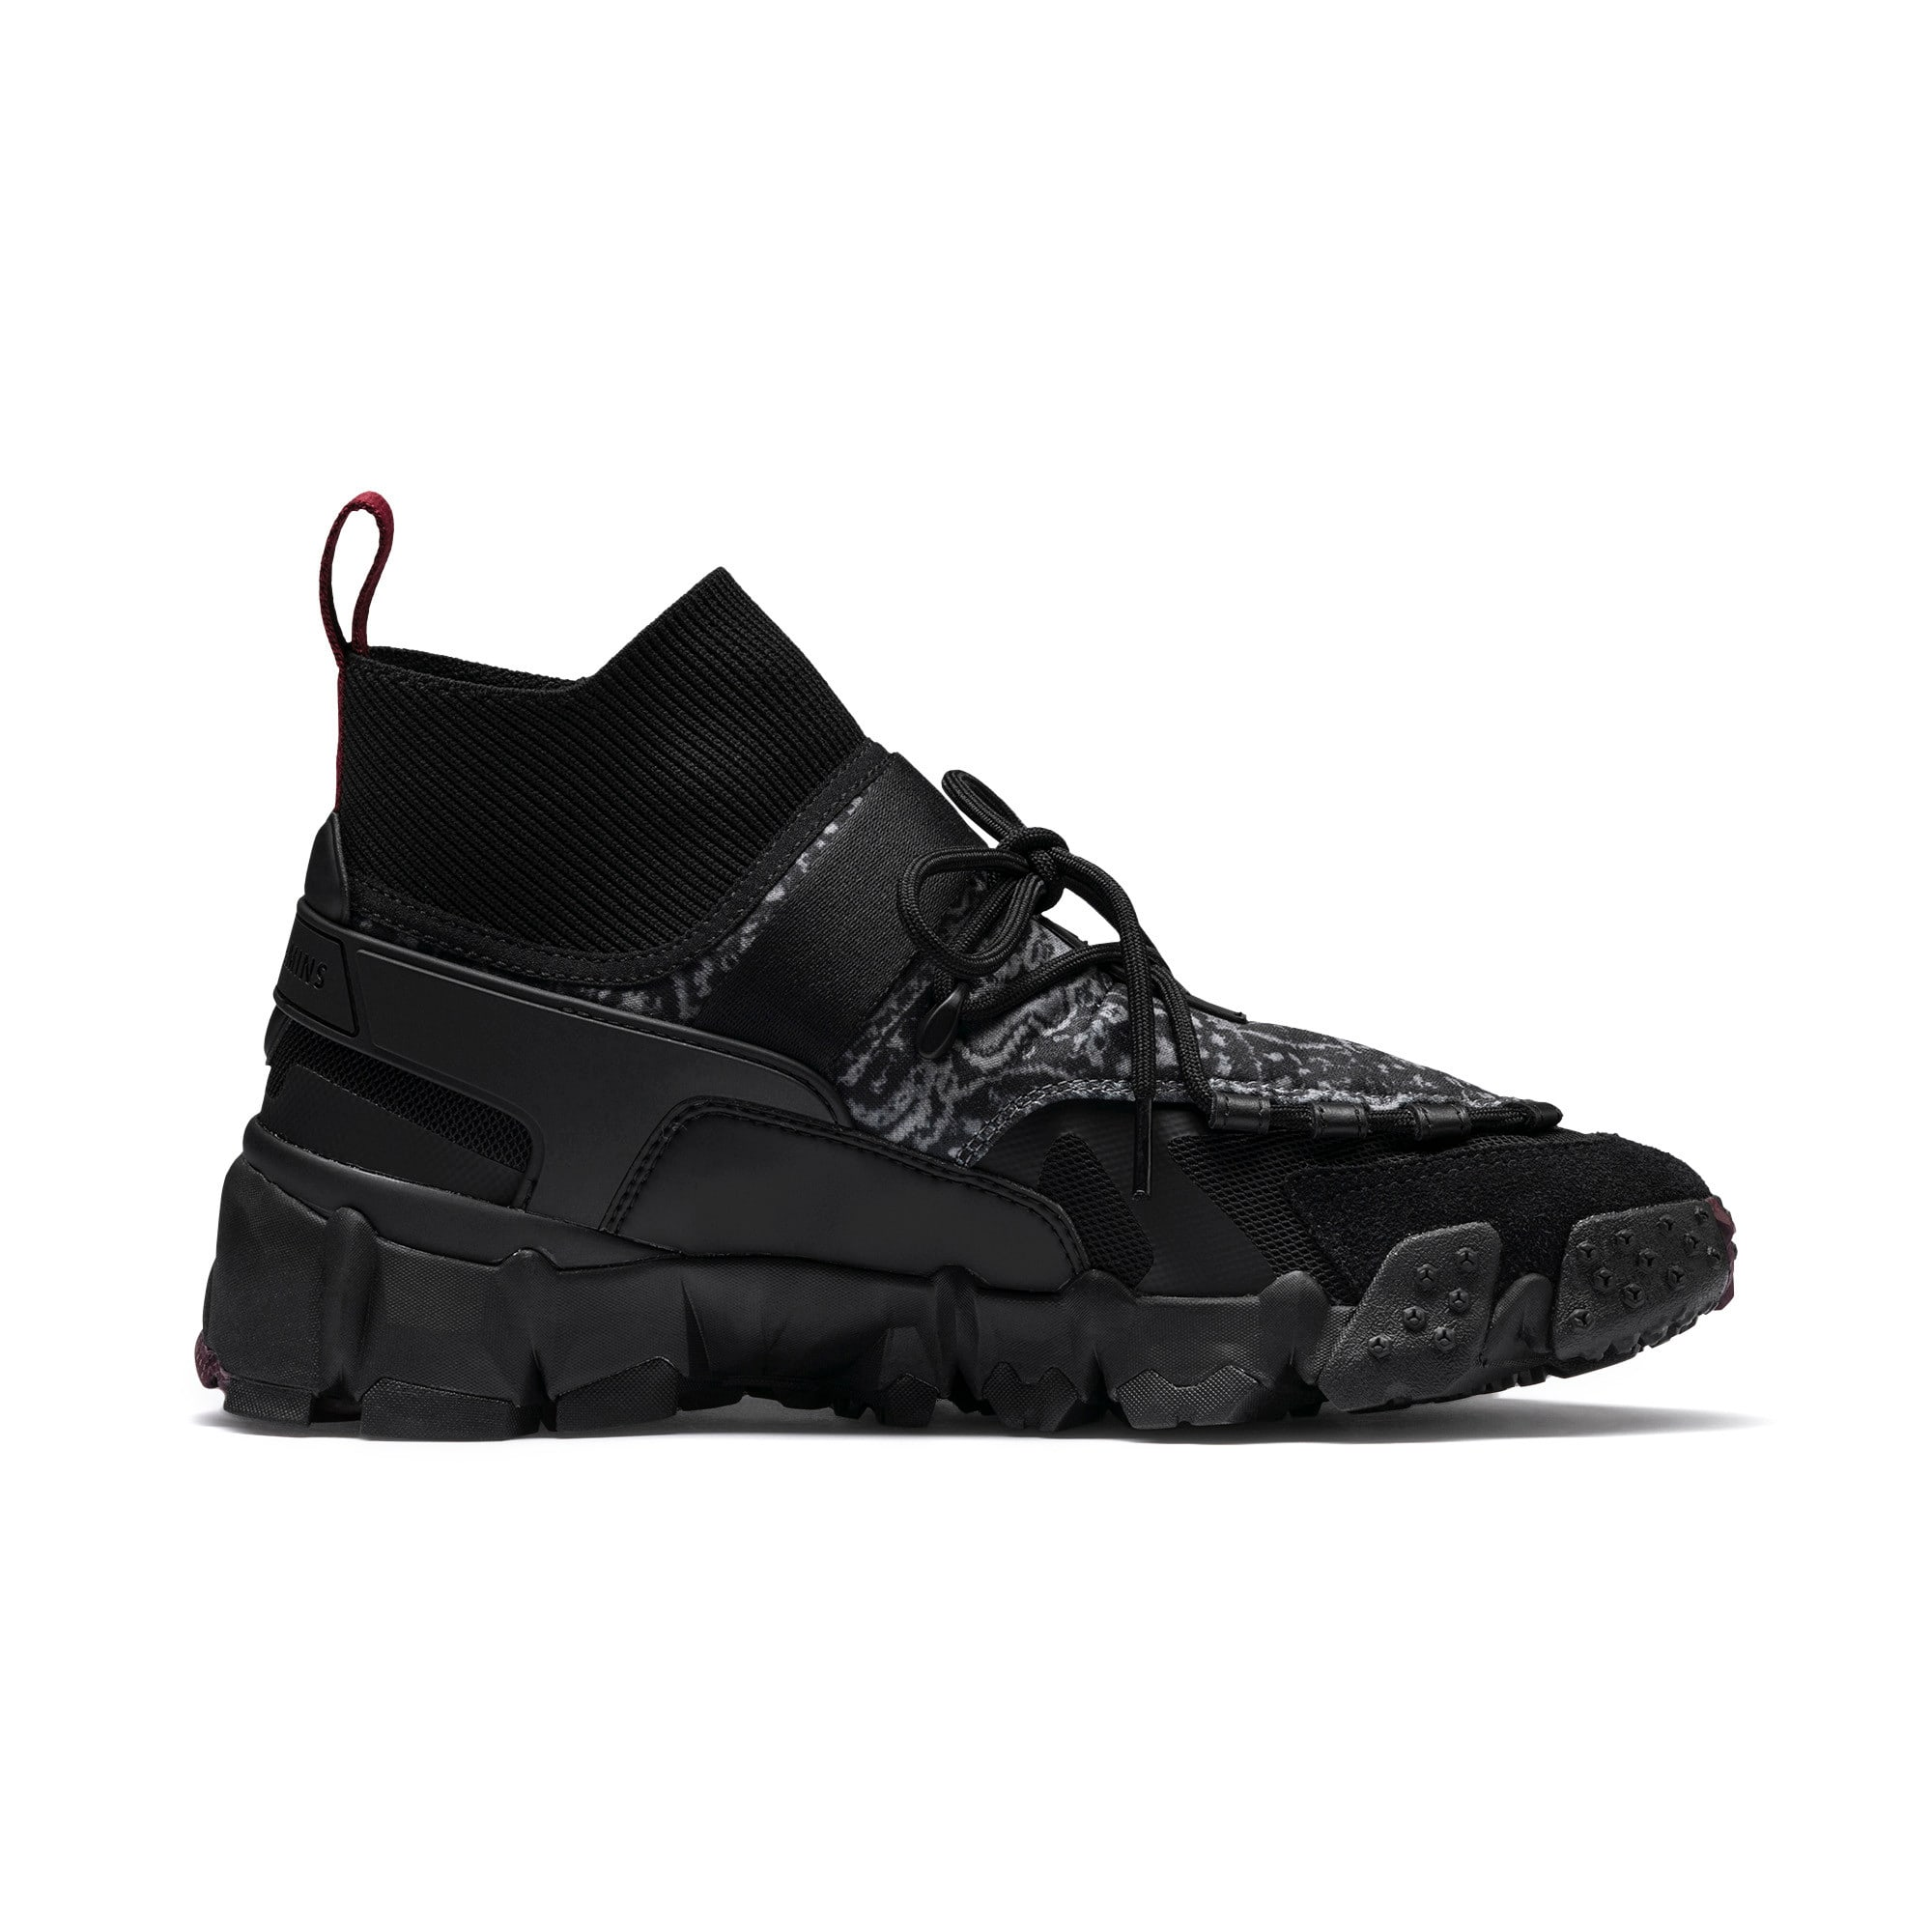 Thumbnail 6 van PUMA x LES BENJAMINS Trailfox schoenen, Puma Black, medium